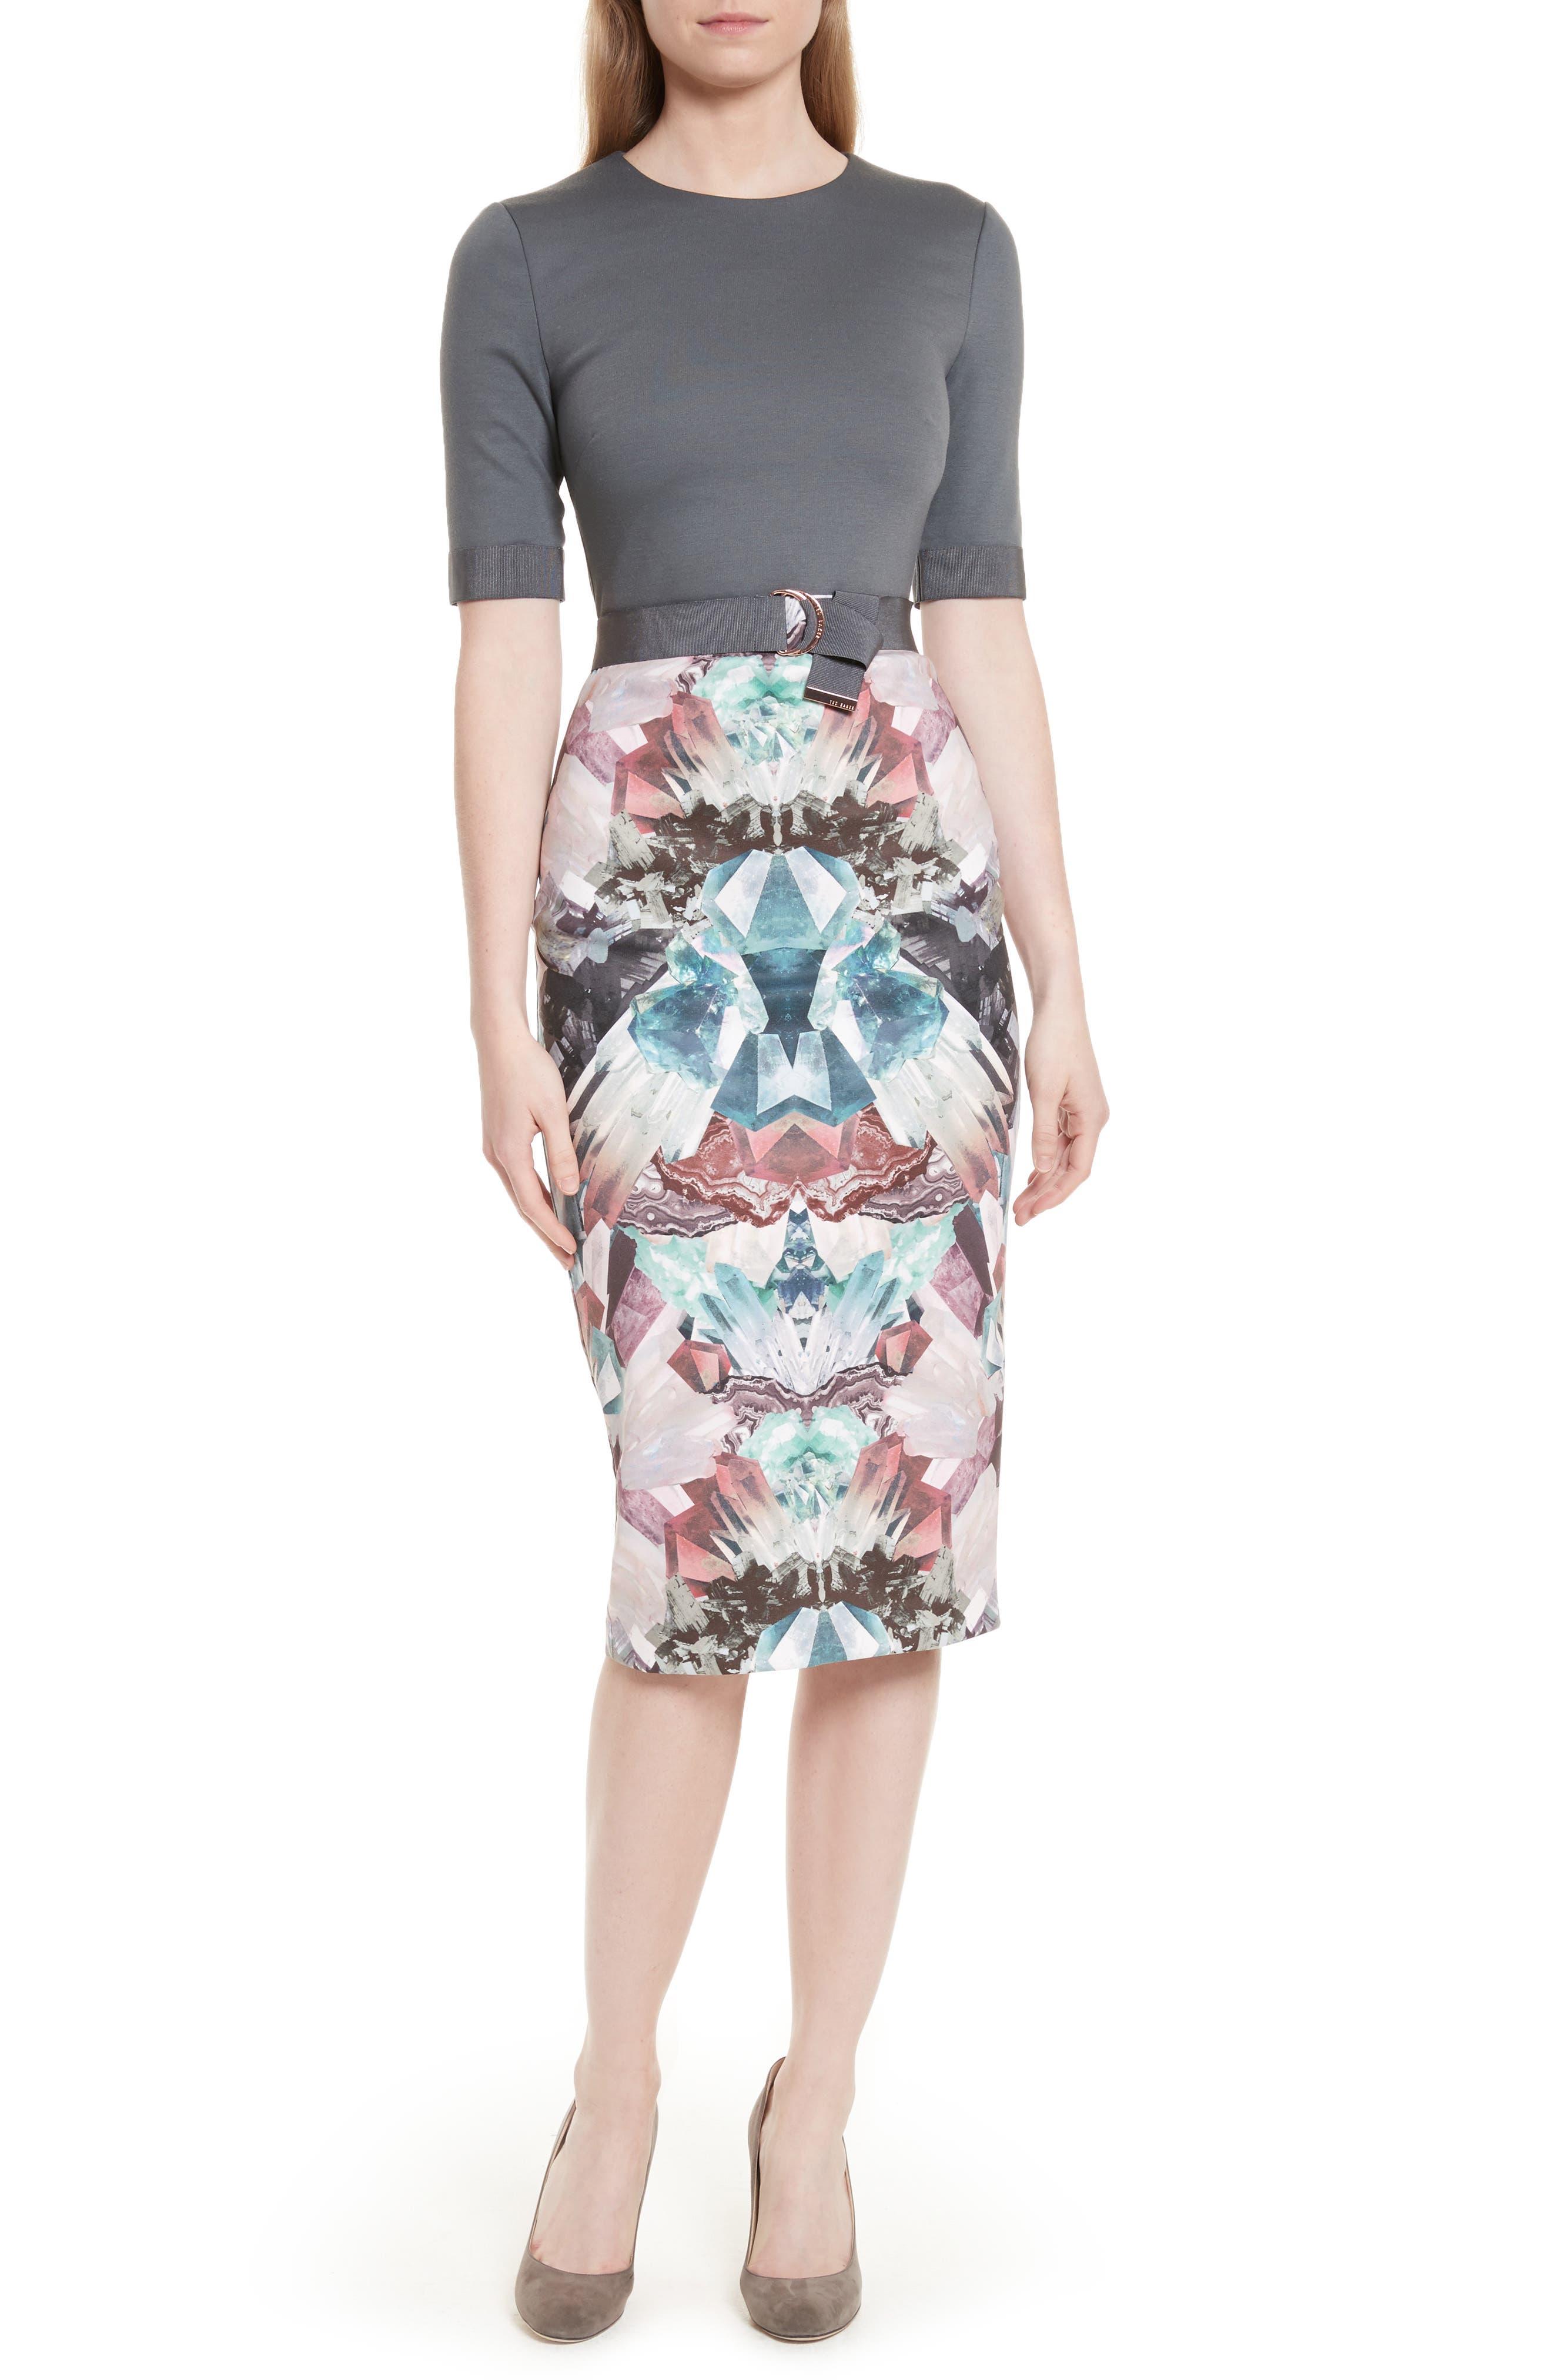 Anaste Mirror Minerals Print Dress,                         Main,                         color, 021